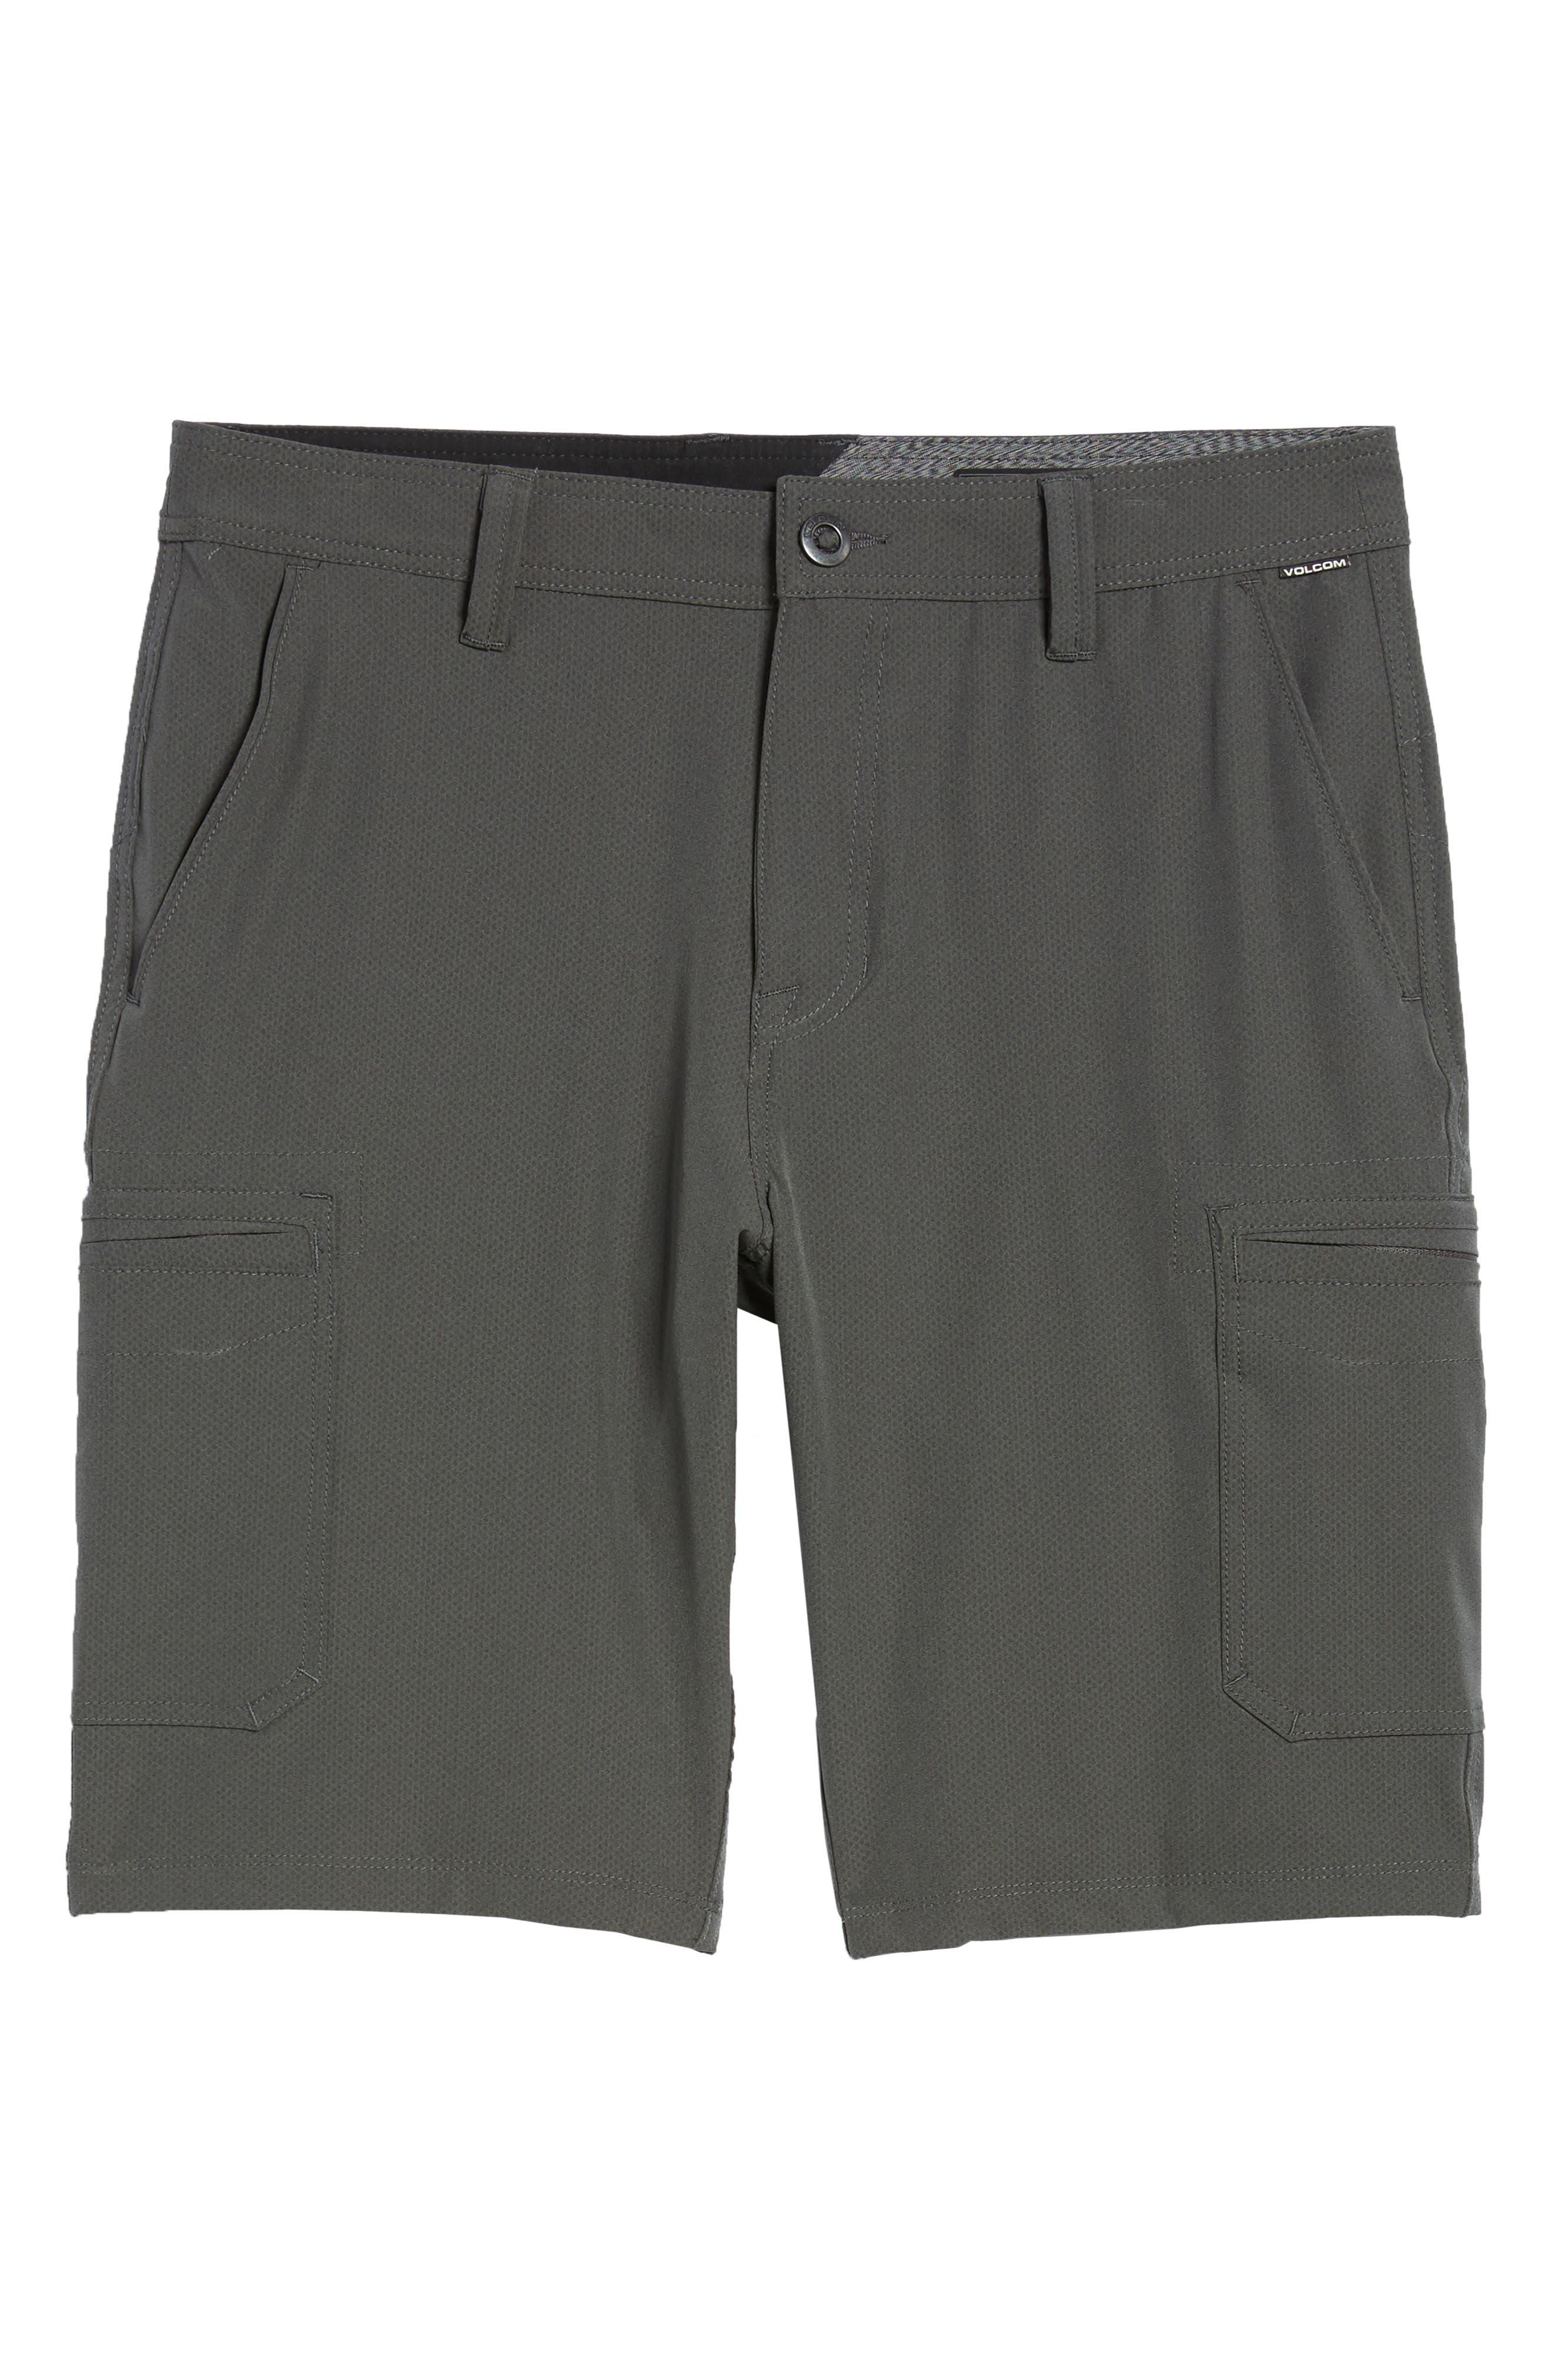 Surf N' Turf Dry Cargo Hybrid Shorts,                             Alternate thumbnail 6, color,                             020